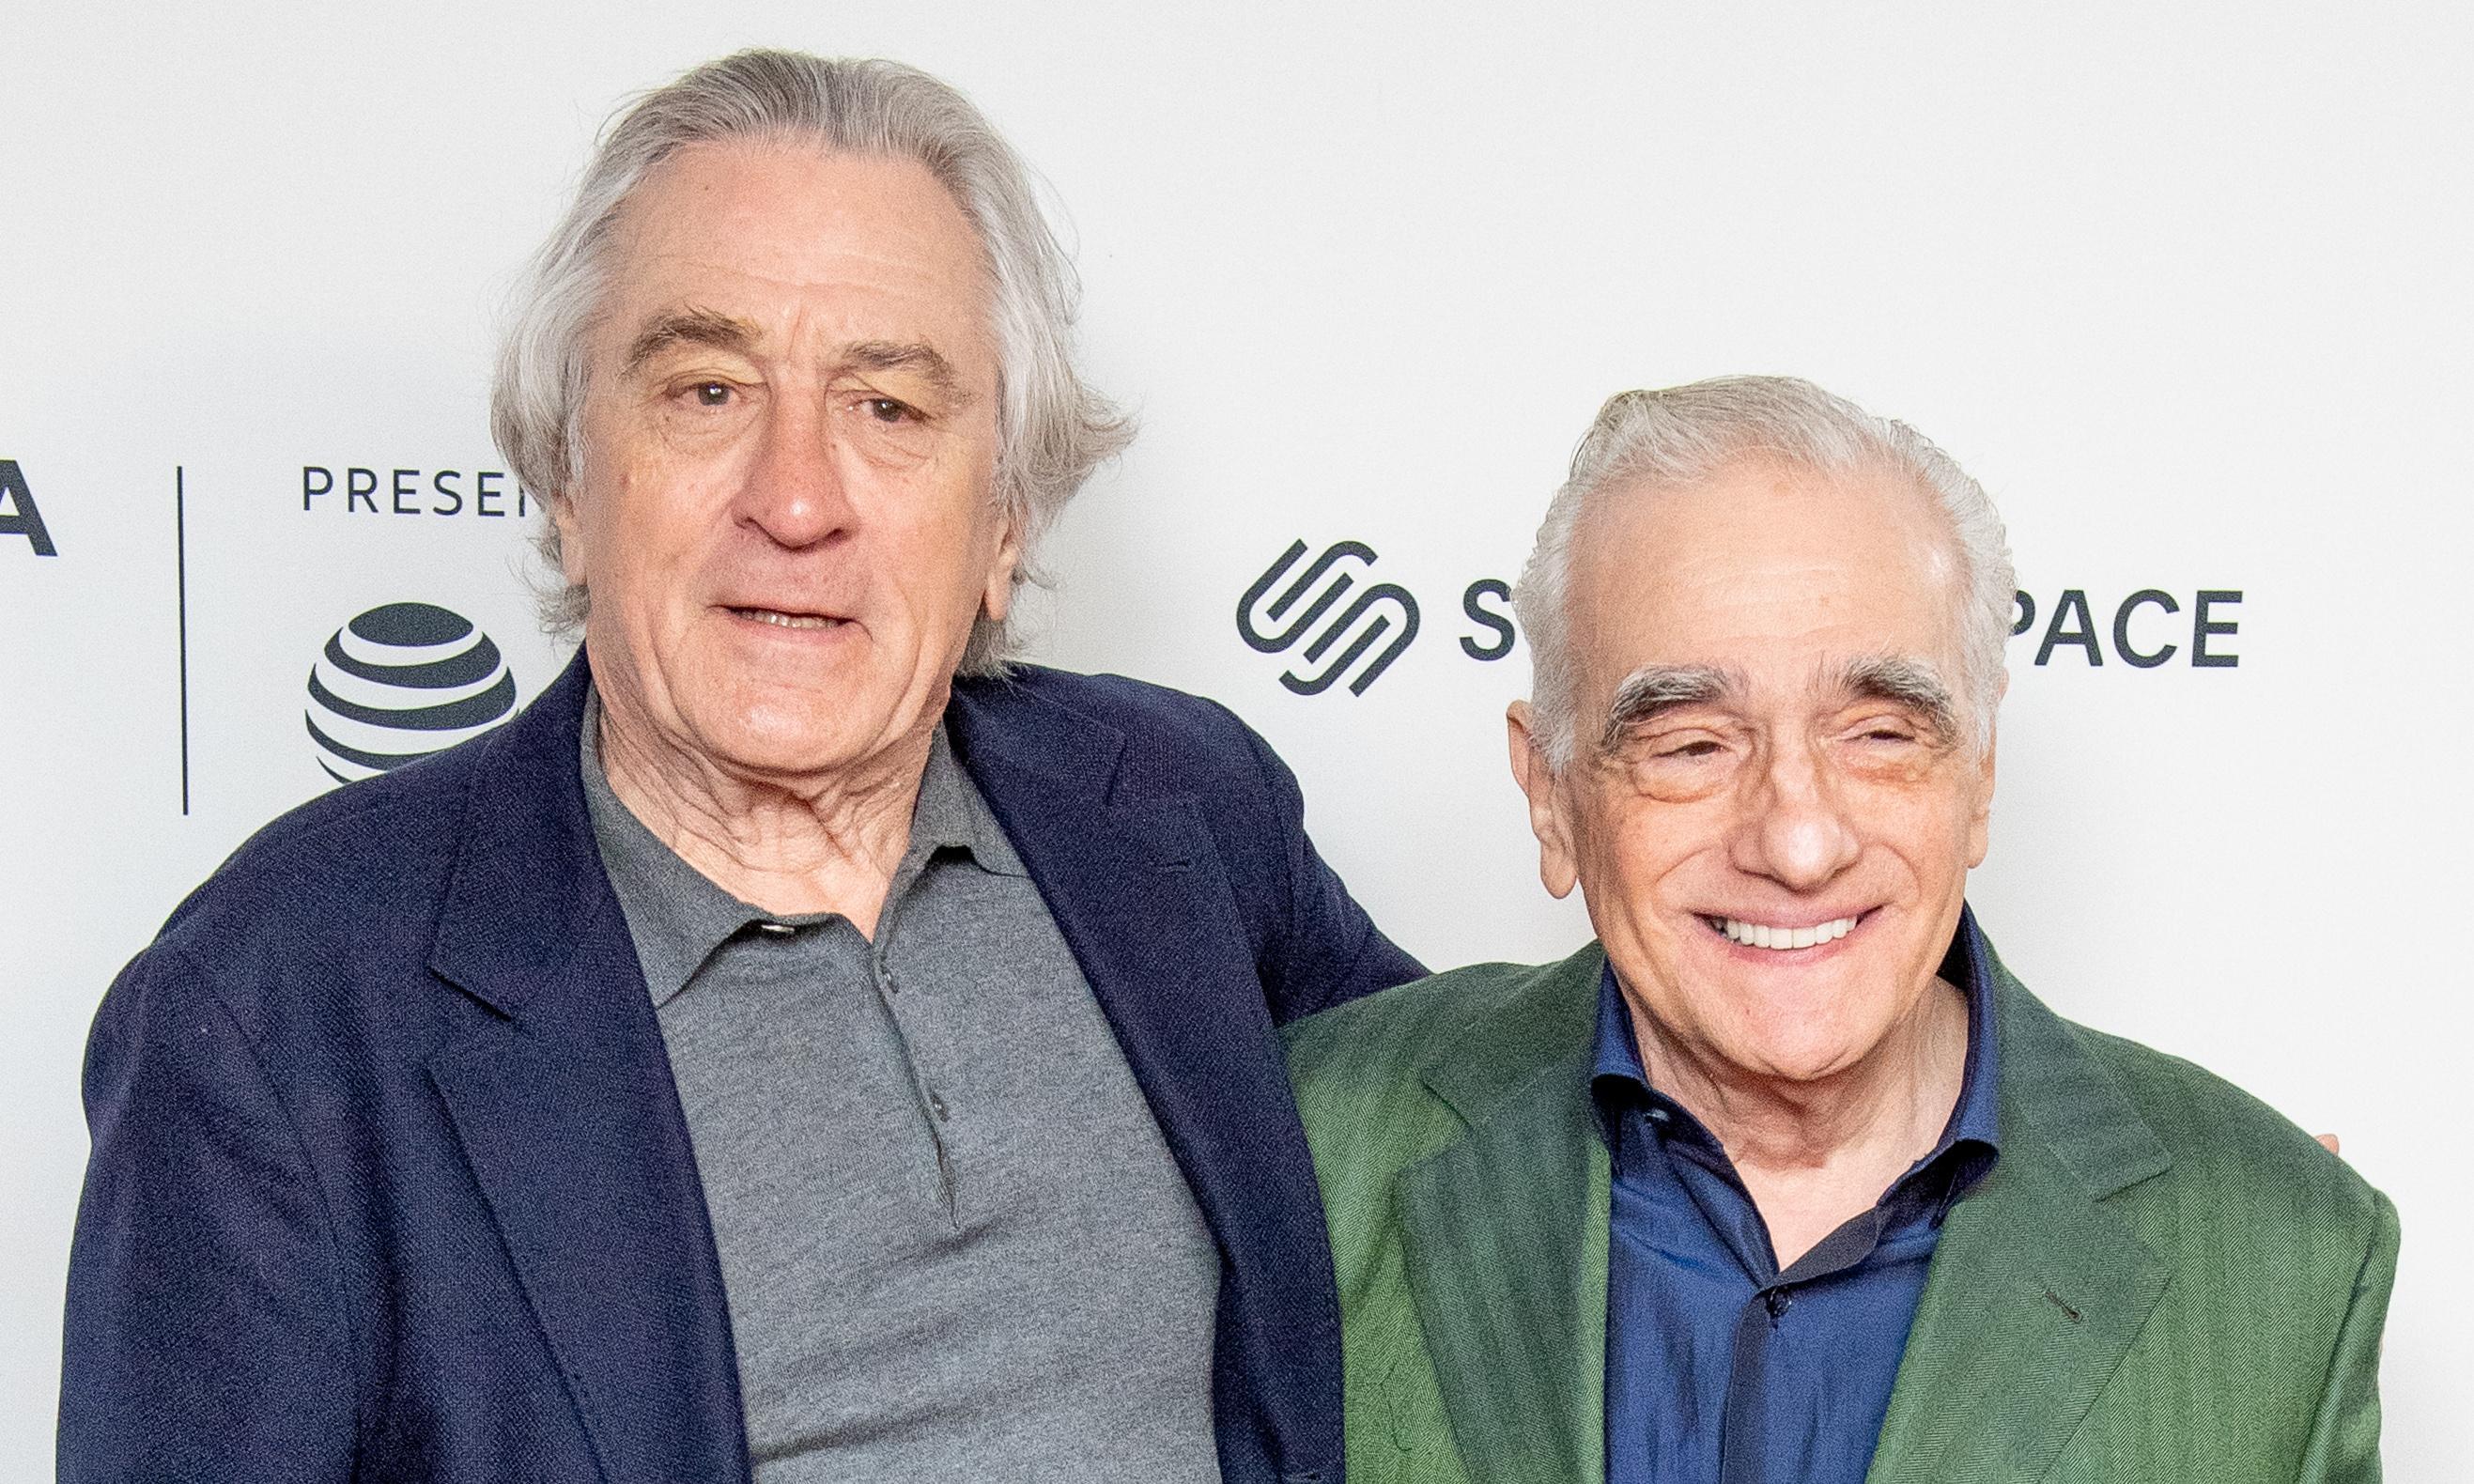 Robert De Niro and Martin Scorsese team up again on 'Osage murders' film